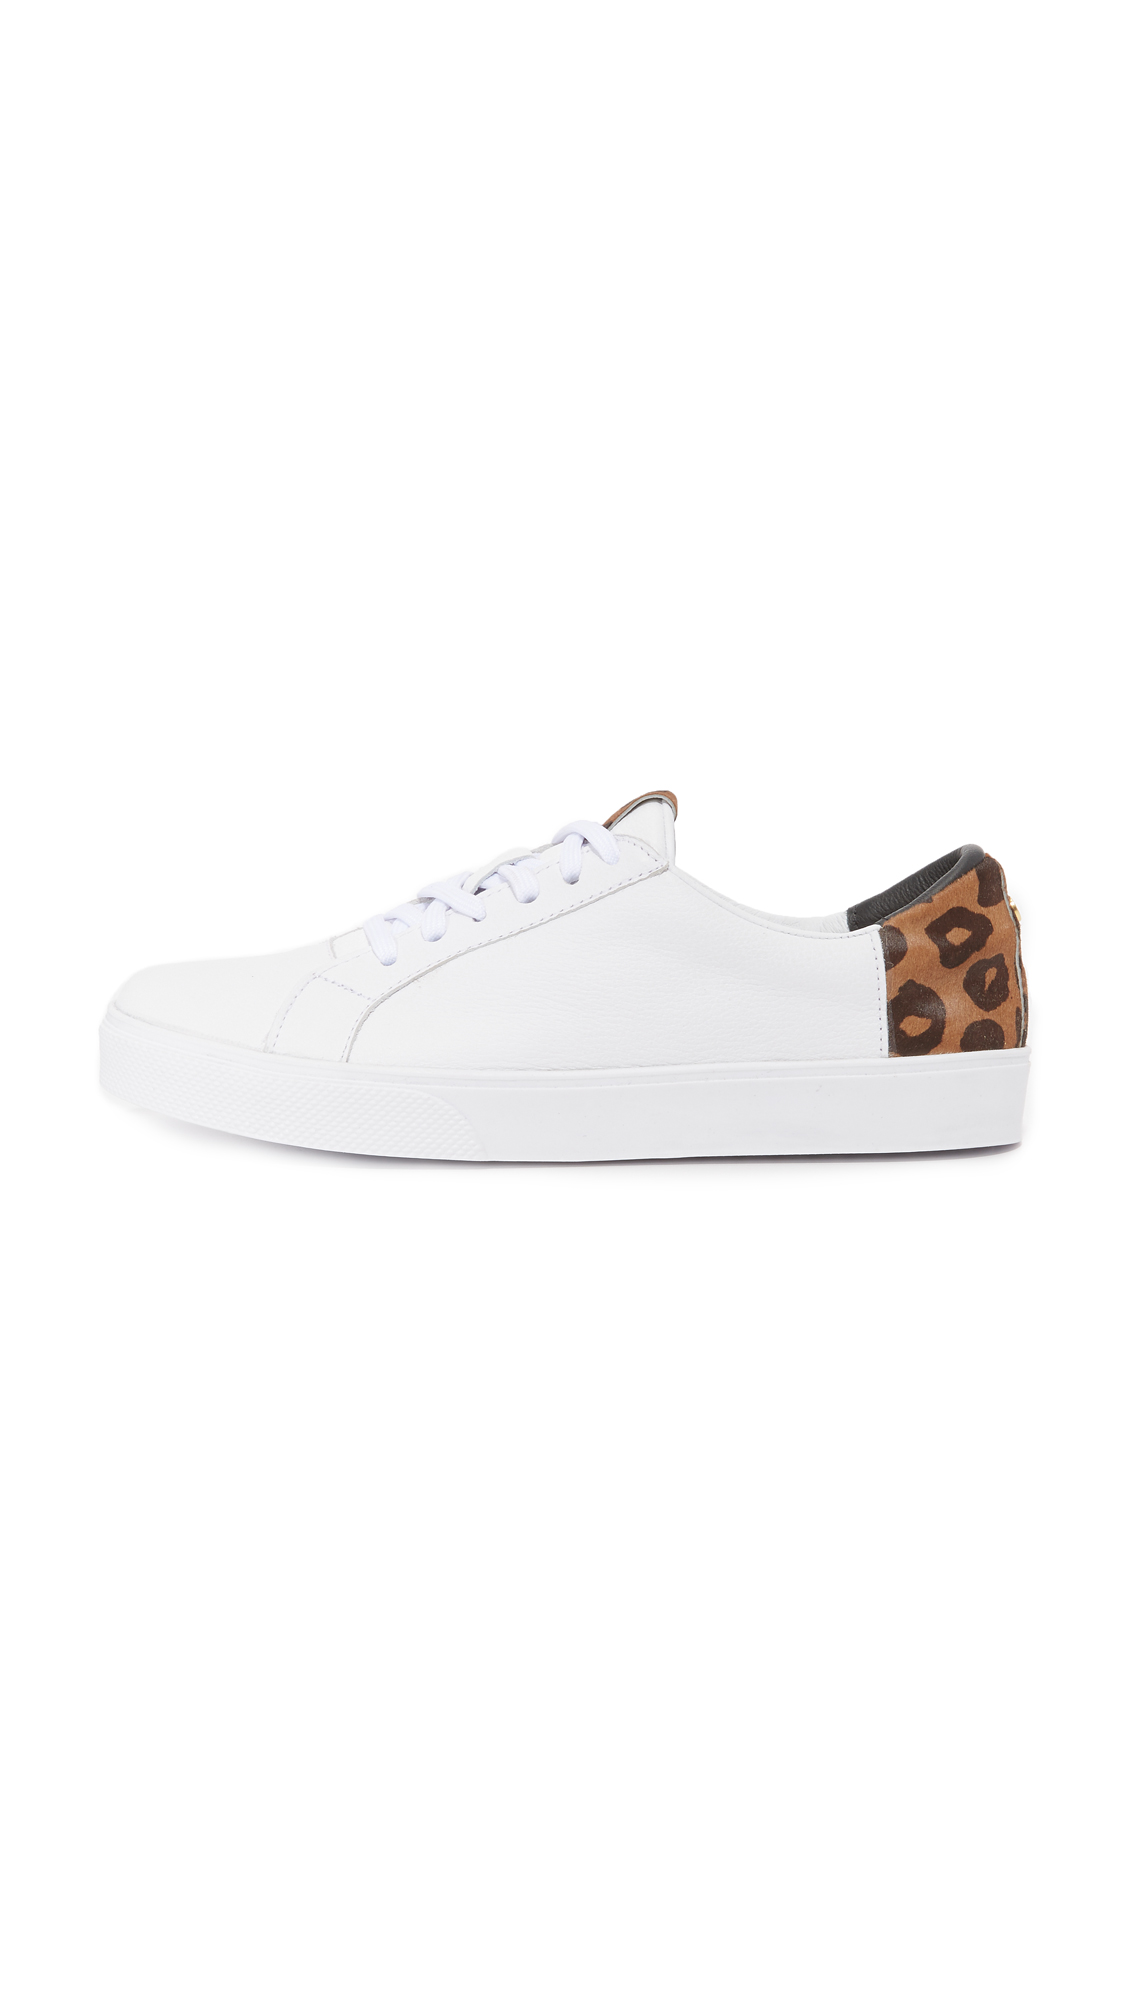 48f5bf3ca392 KAANAS San Rafael Sneakers